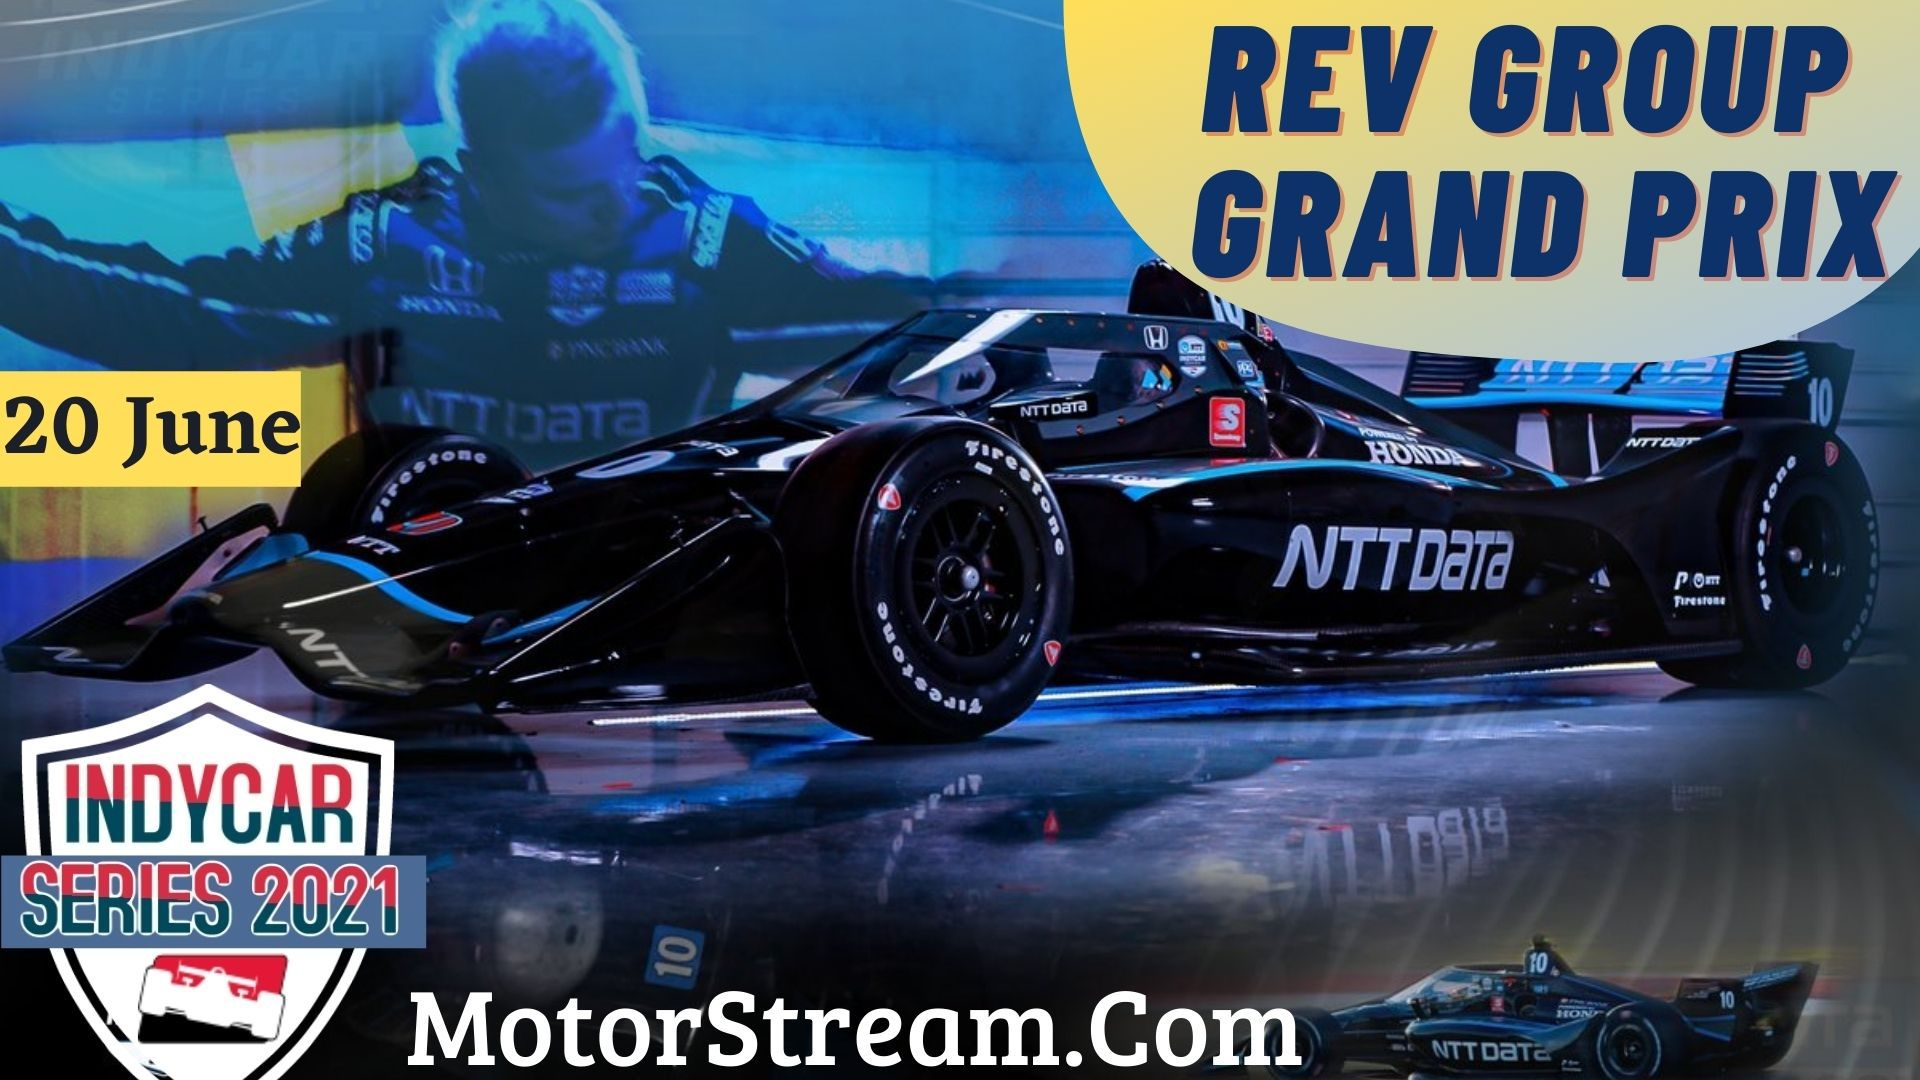 REV Group Grand Prix Live Stream 2021